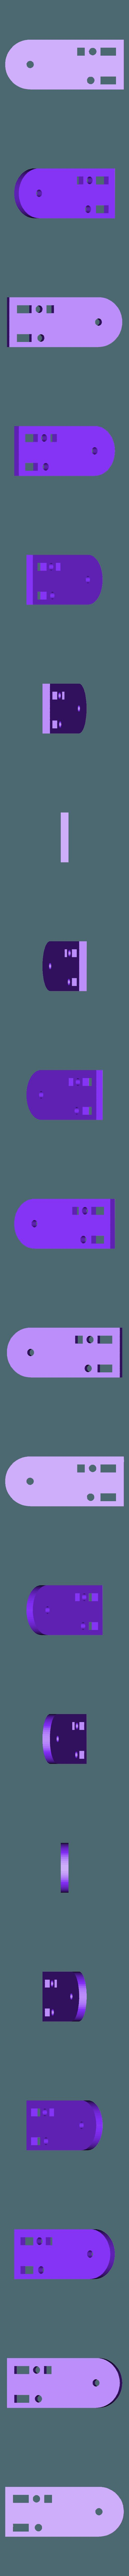 Leg_Bottom_Pivot_Plate.stl Download free STL file mePed Quadruped Robot • 3D printing template, MinorSymphony